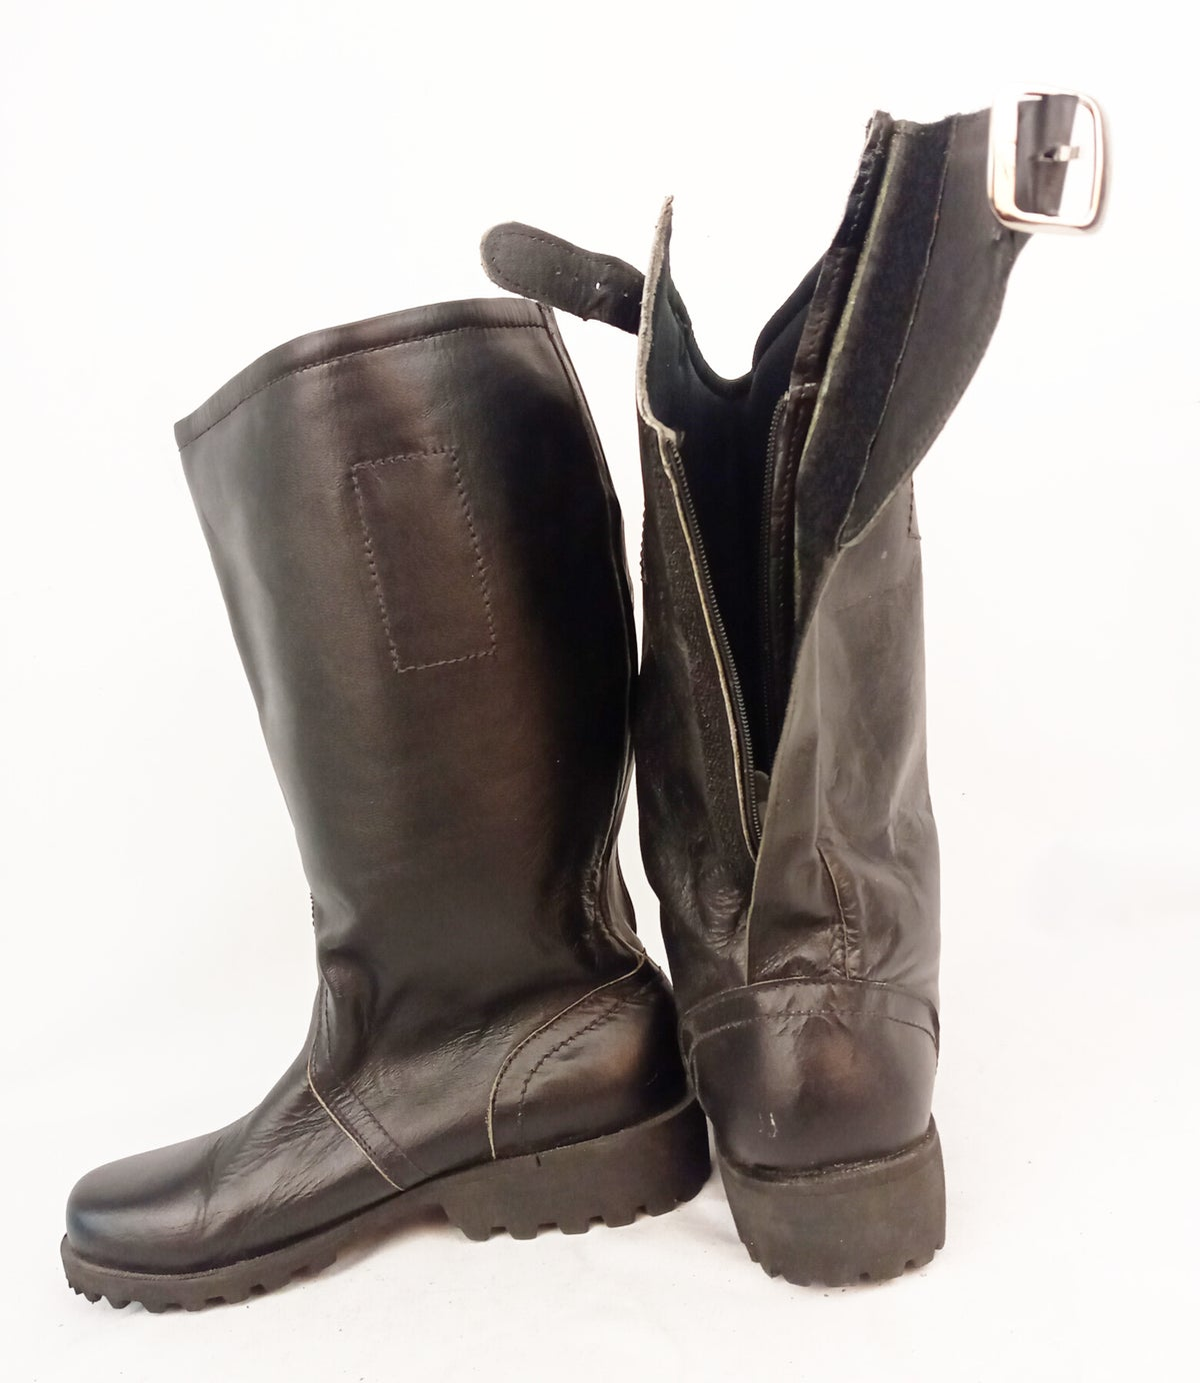 Image of #9 - B Grade from Stock - Shoe Size EU 36